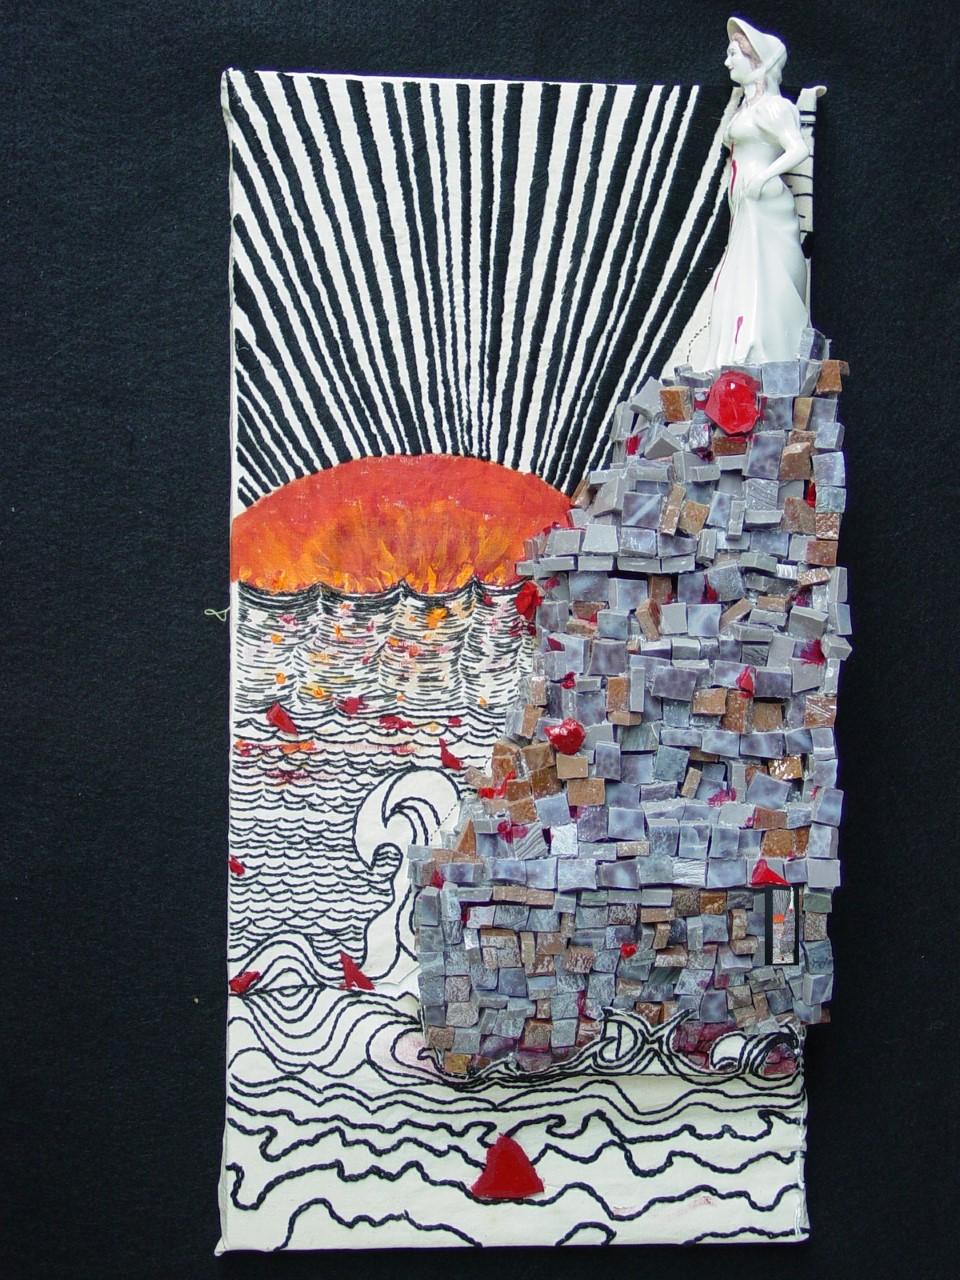 Heartbroken   Cotton, embroidery thread, smalti, acrylic, stained glass